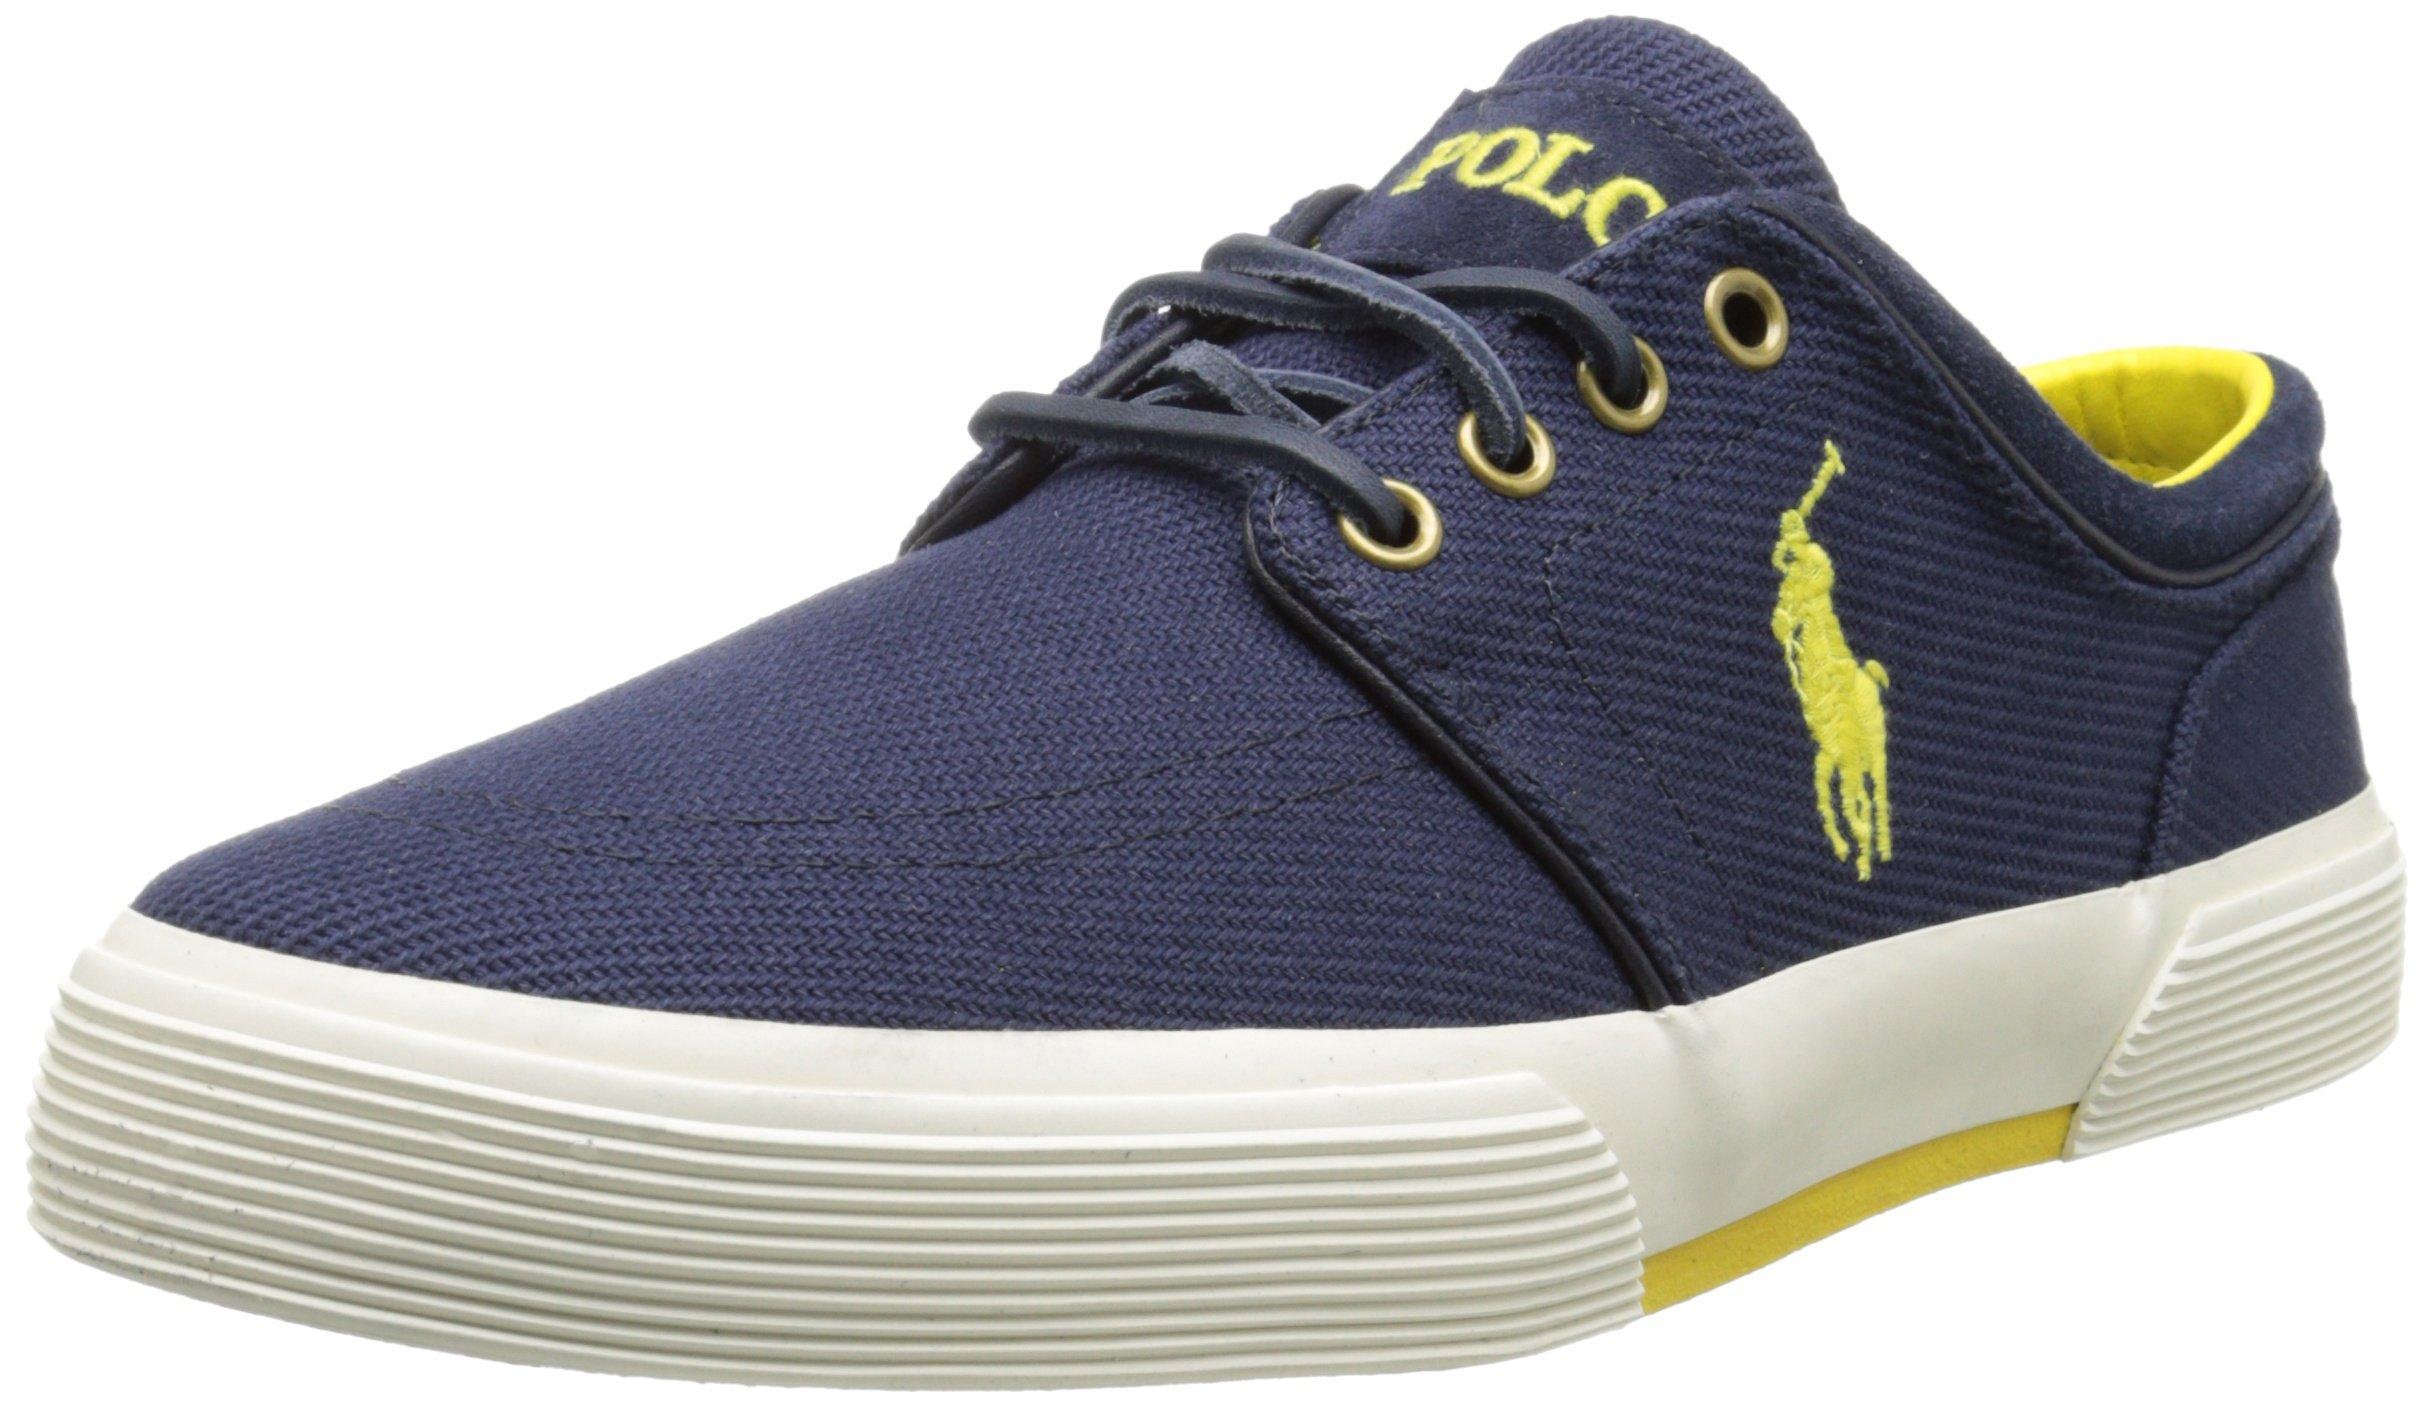 Polo Ralph Lauren Men's Faxon Low Rubber Fashion Sneaker